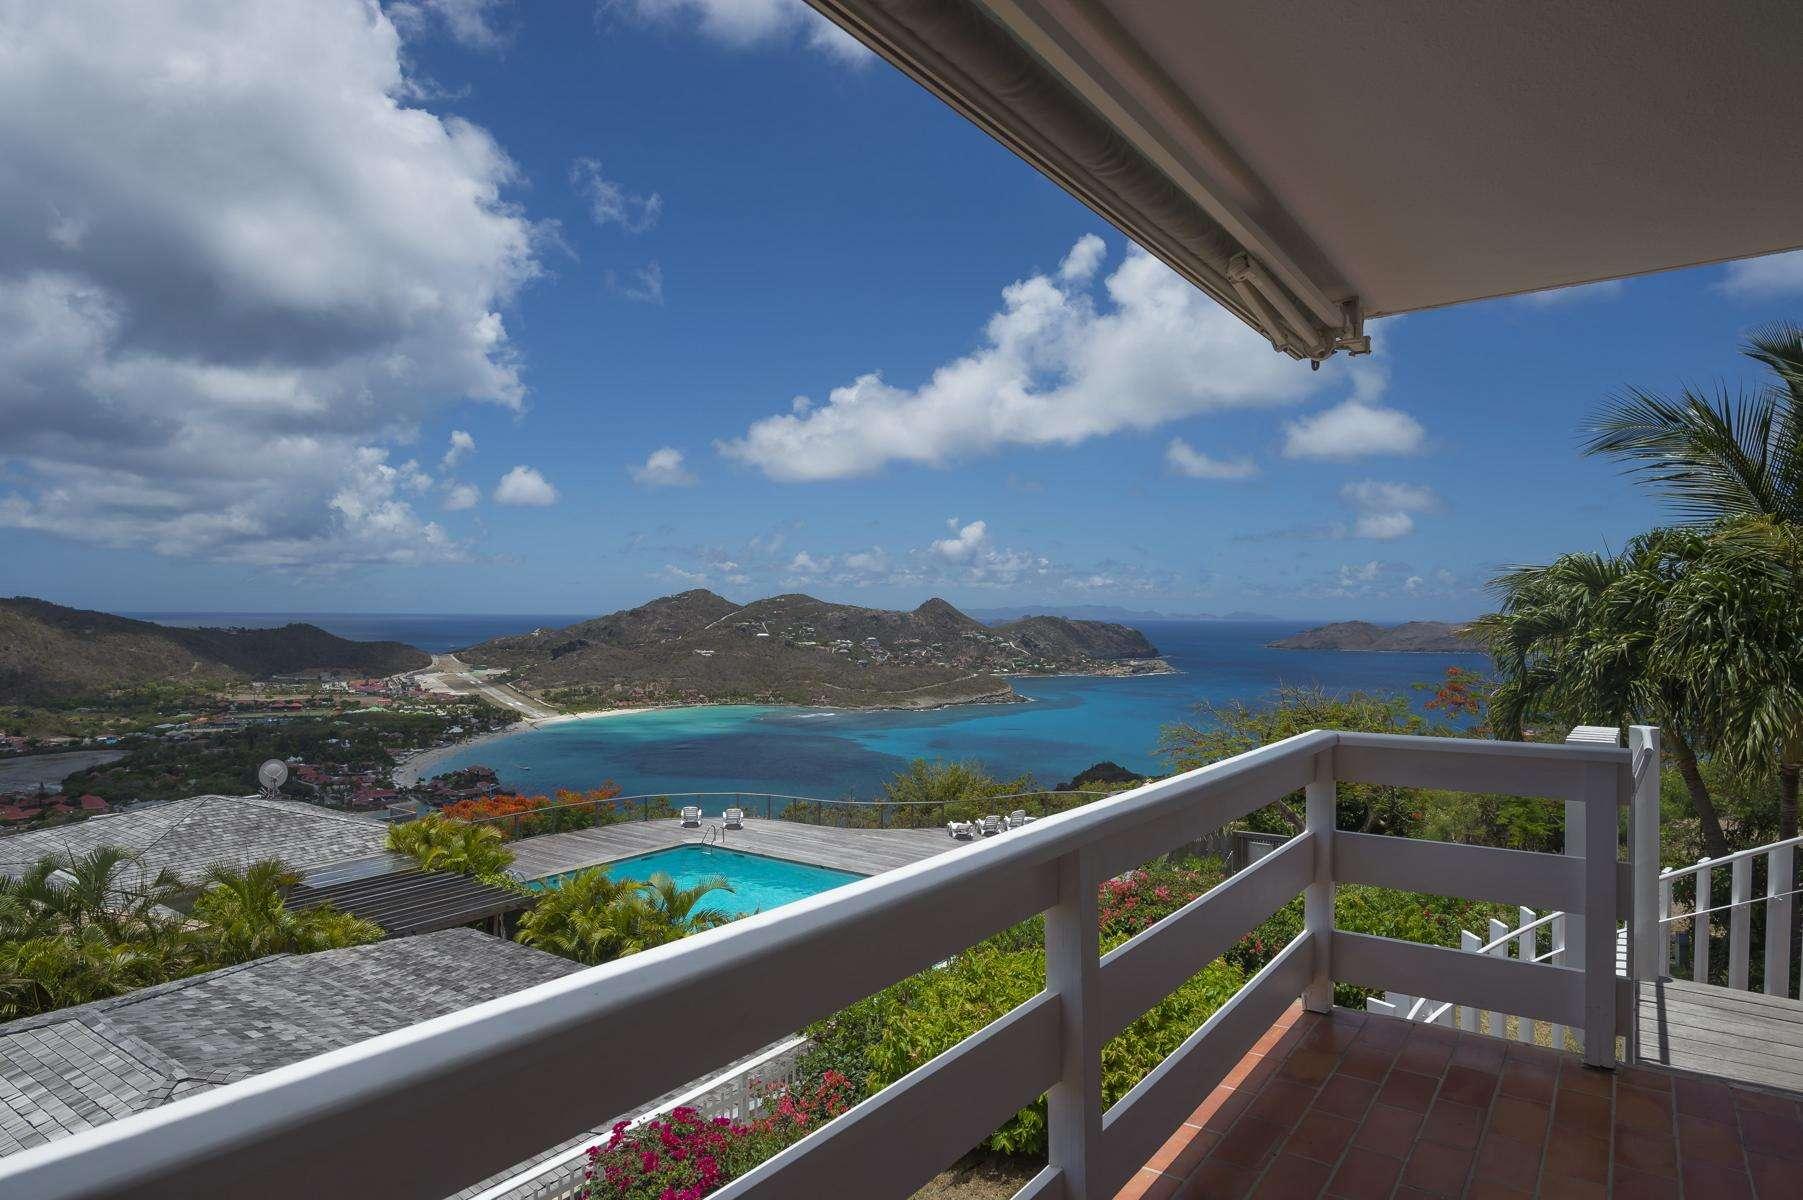 Luxury villa rentals caribbean - St barthelemy - Saint jean - les Terrasses de Saint Jean 05 - Image 1/12